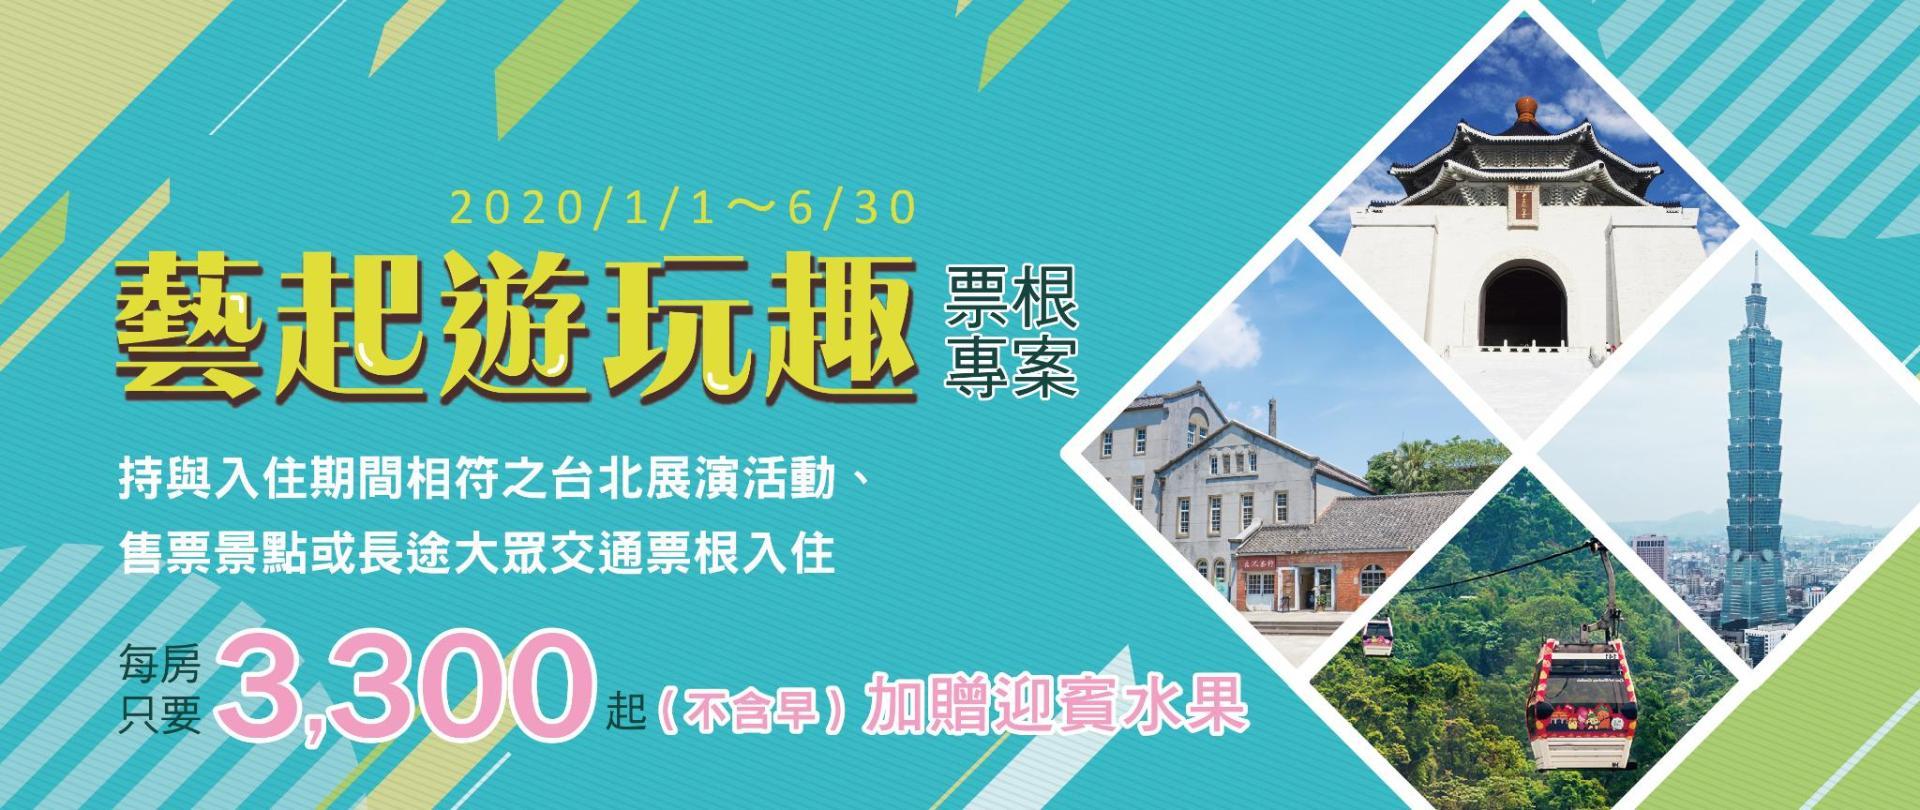 Slide Show1920X810_2020藝起遊玩趣.jpg